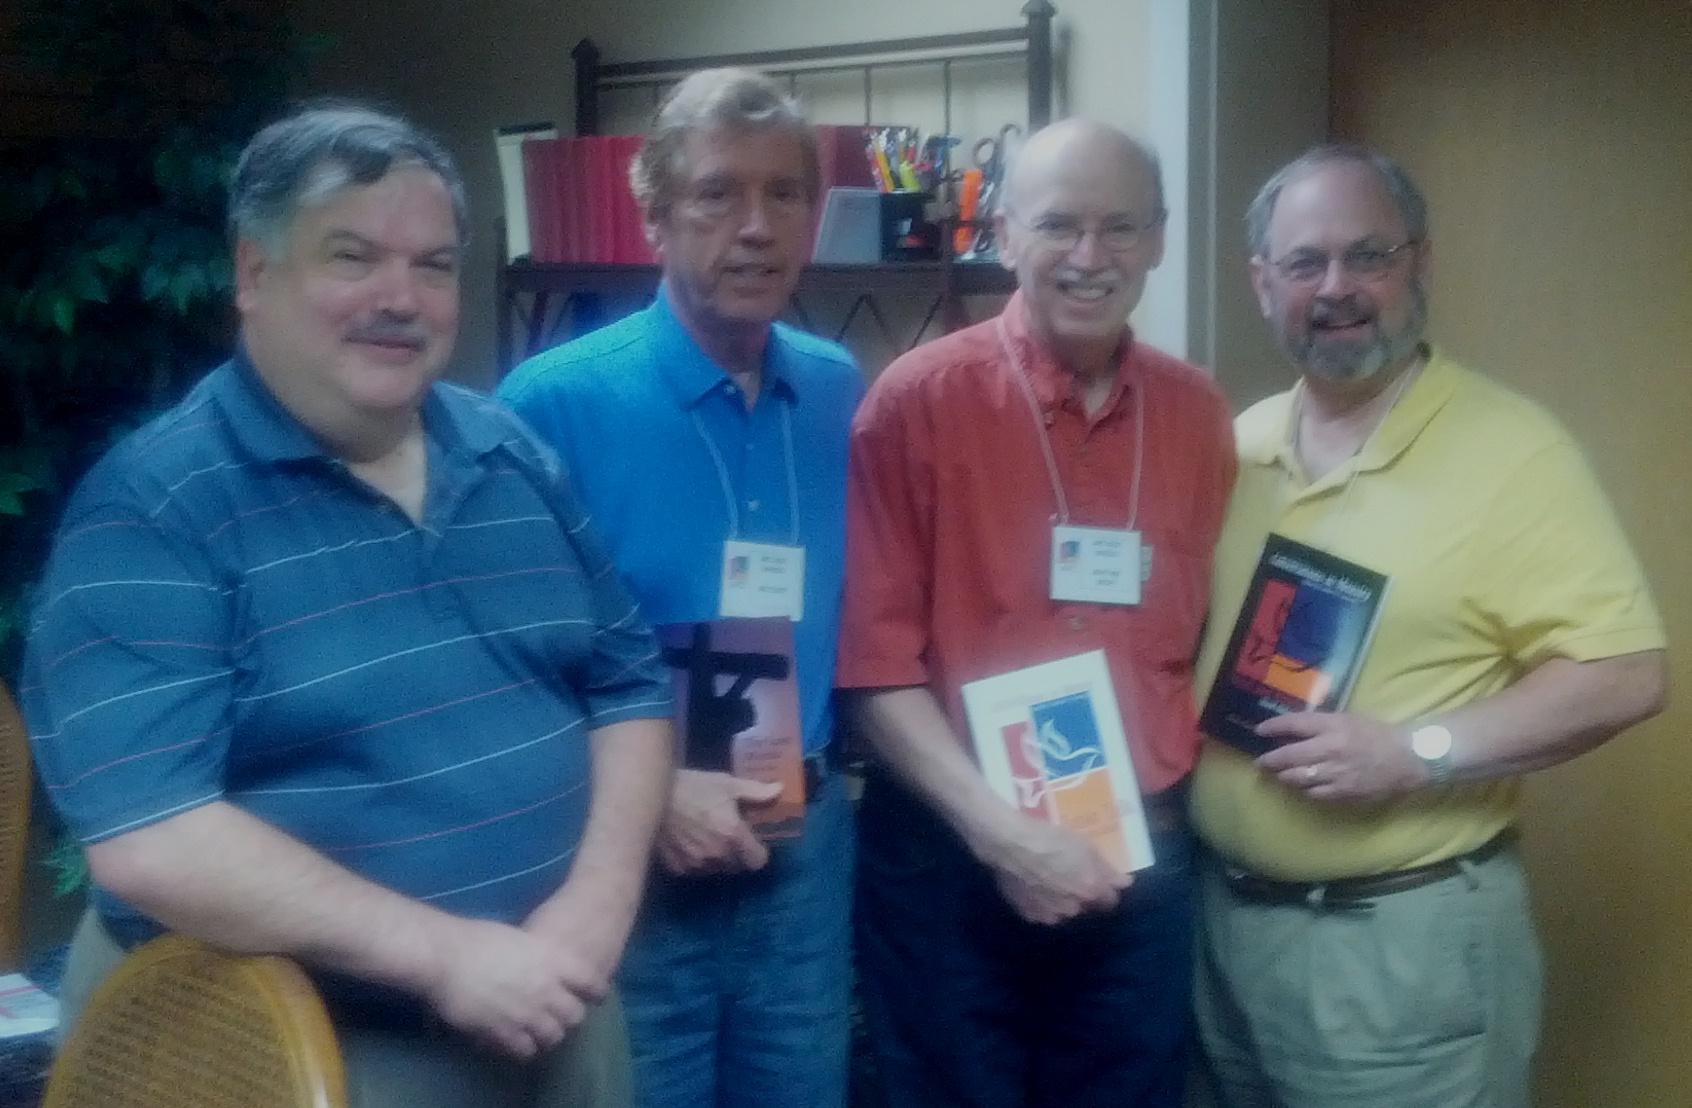 APC Convention 2013 authors